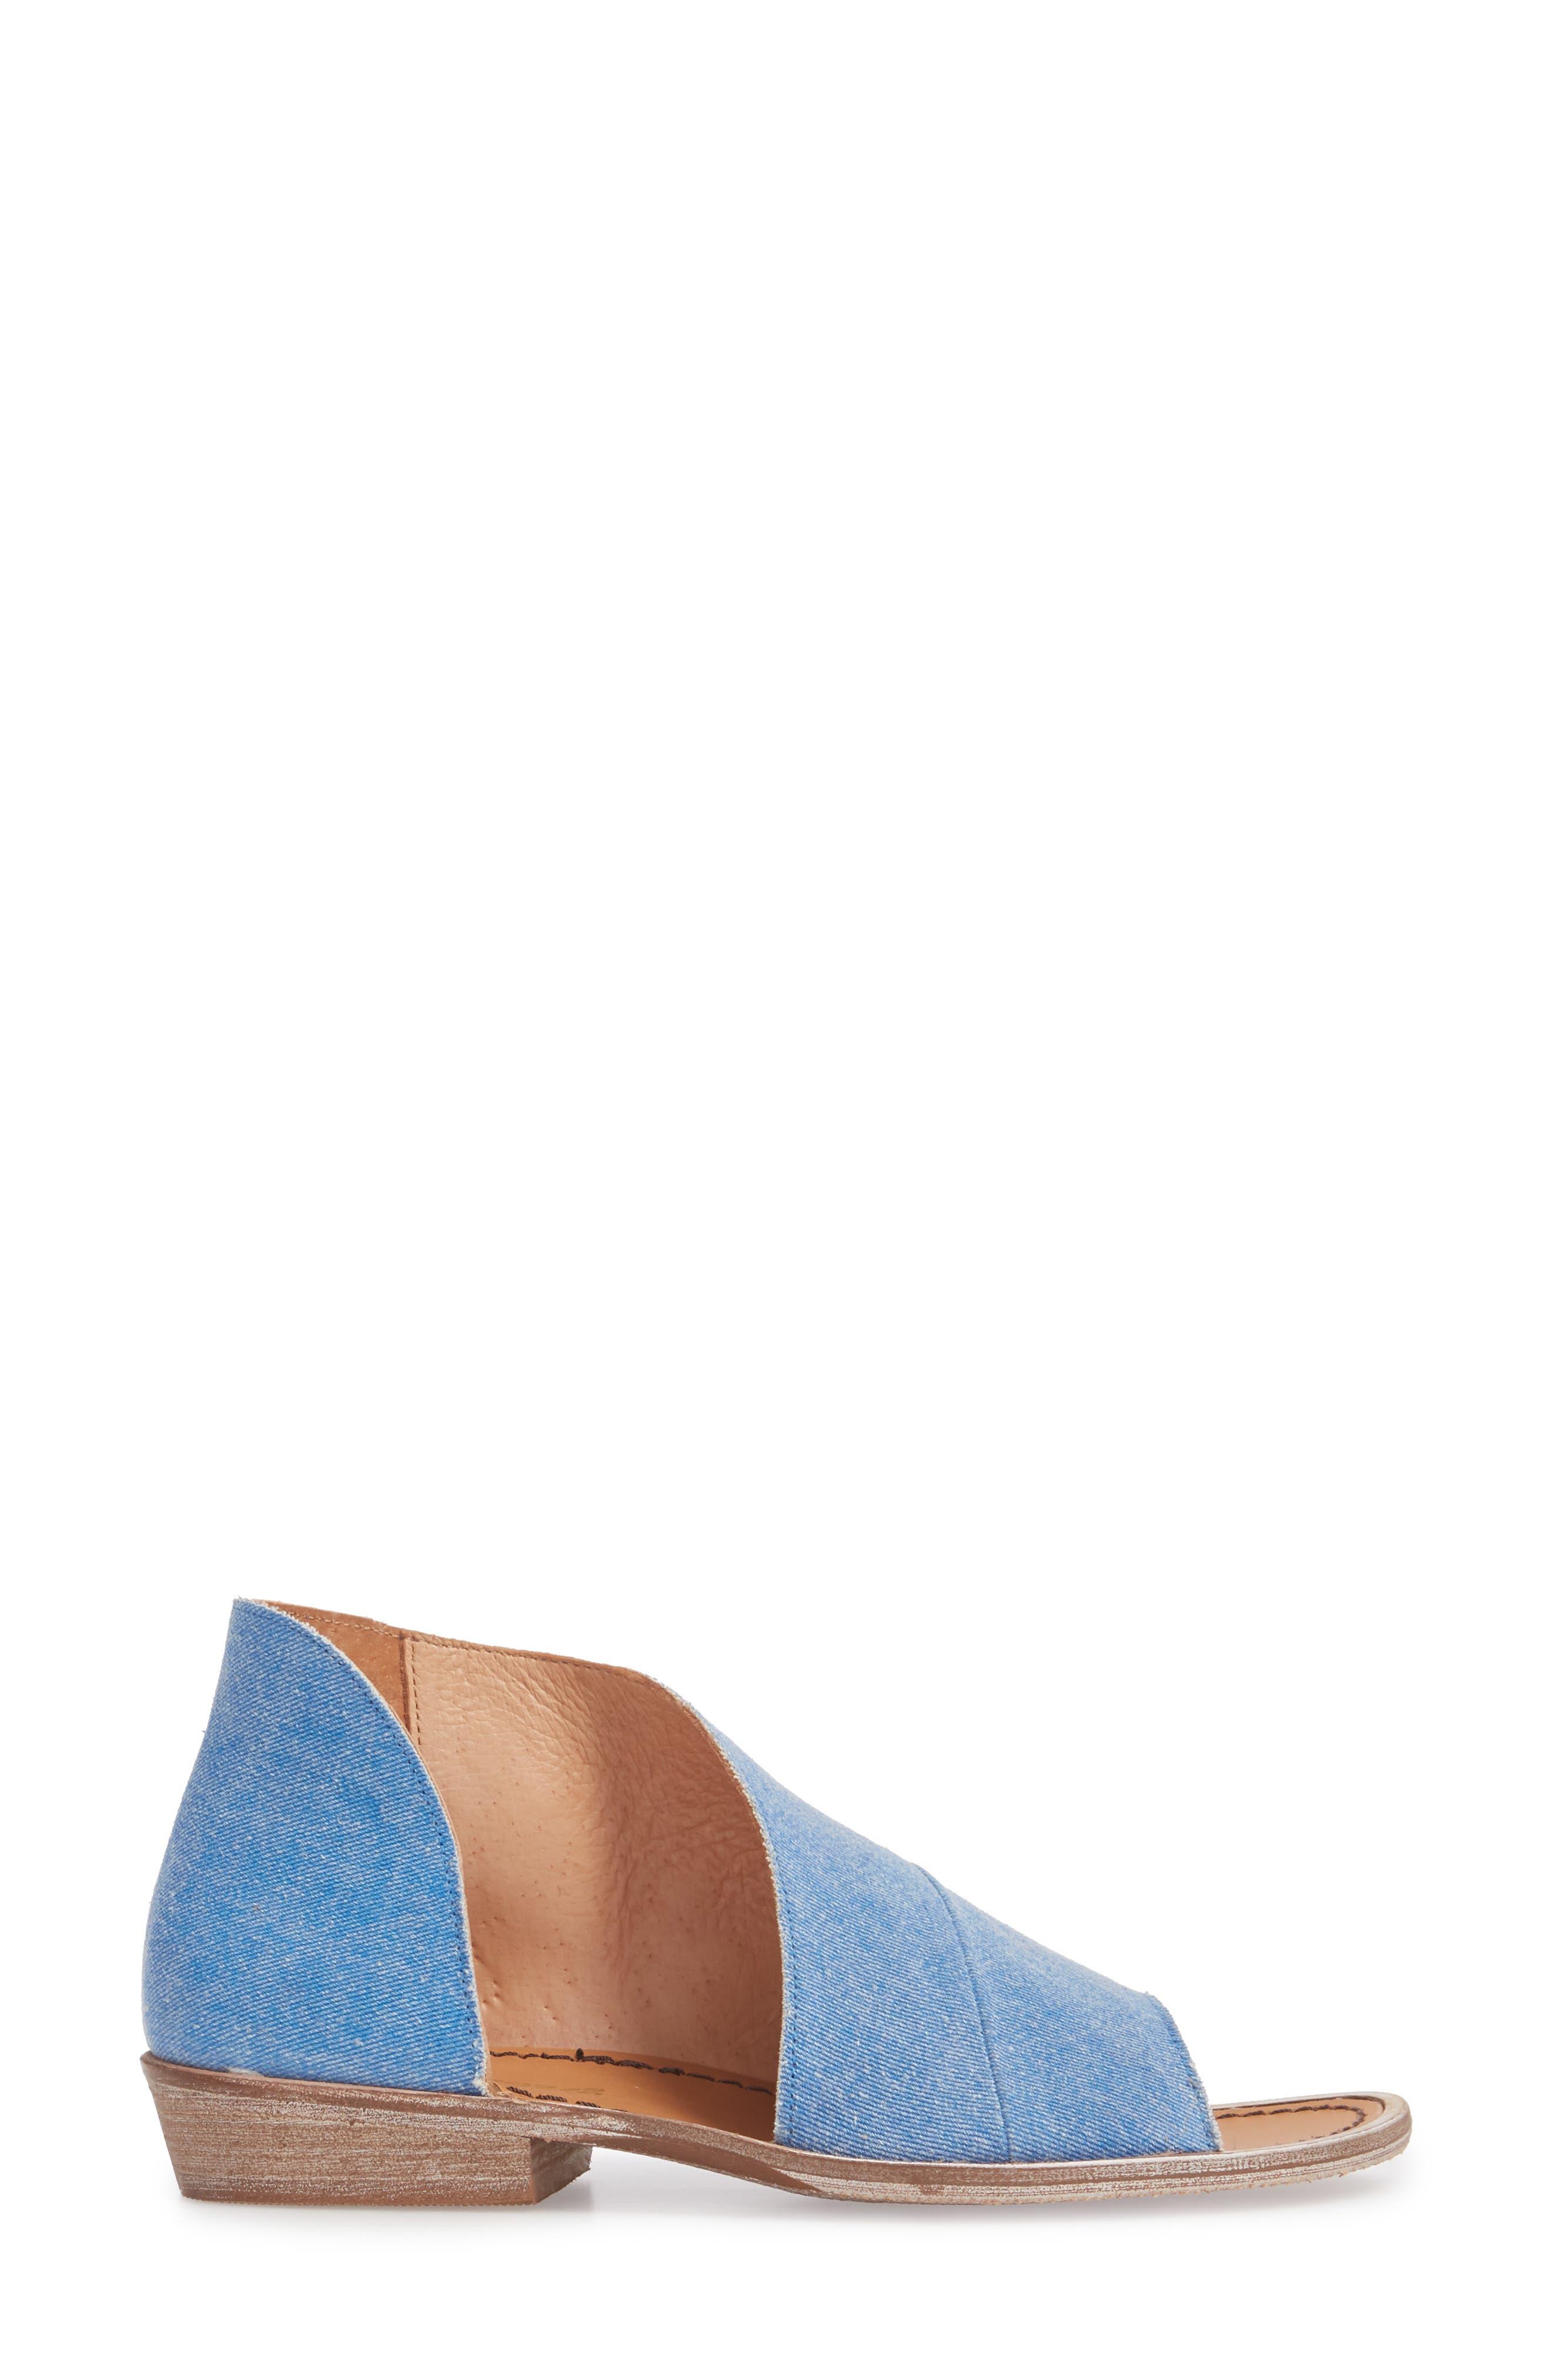 'Mont Blanc' Asymmetrical Sandal,                             Alternate thumbnail 33, color,